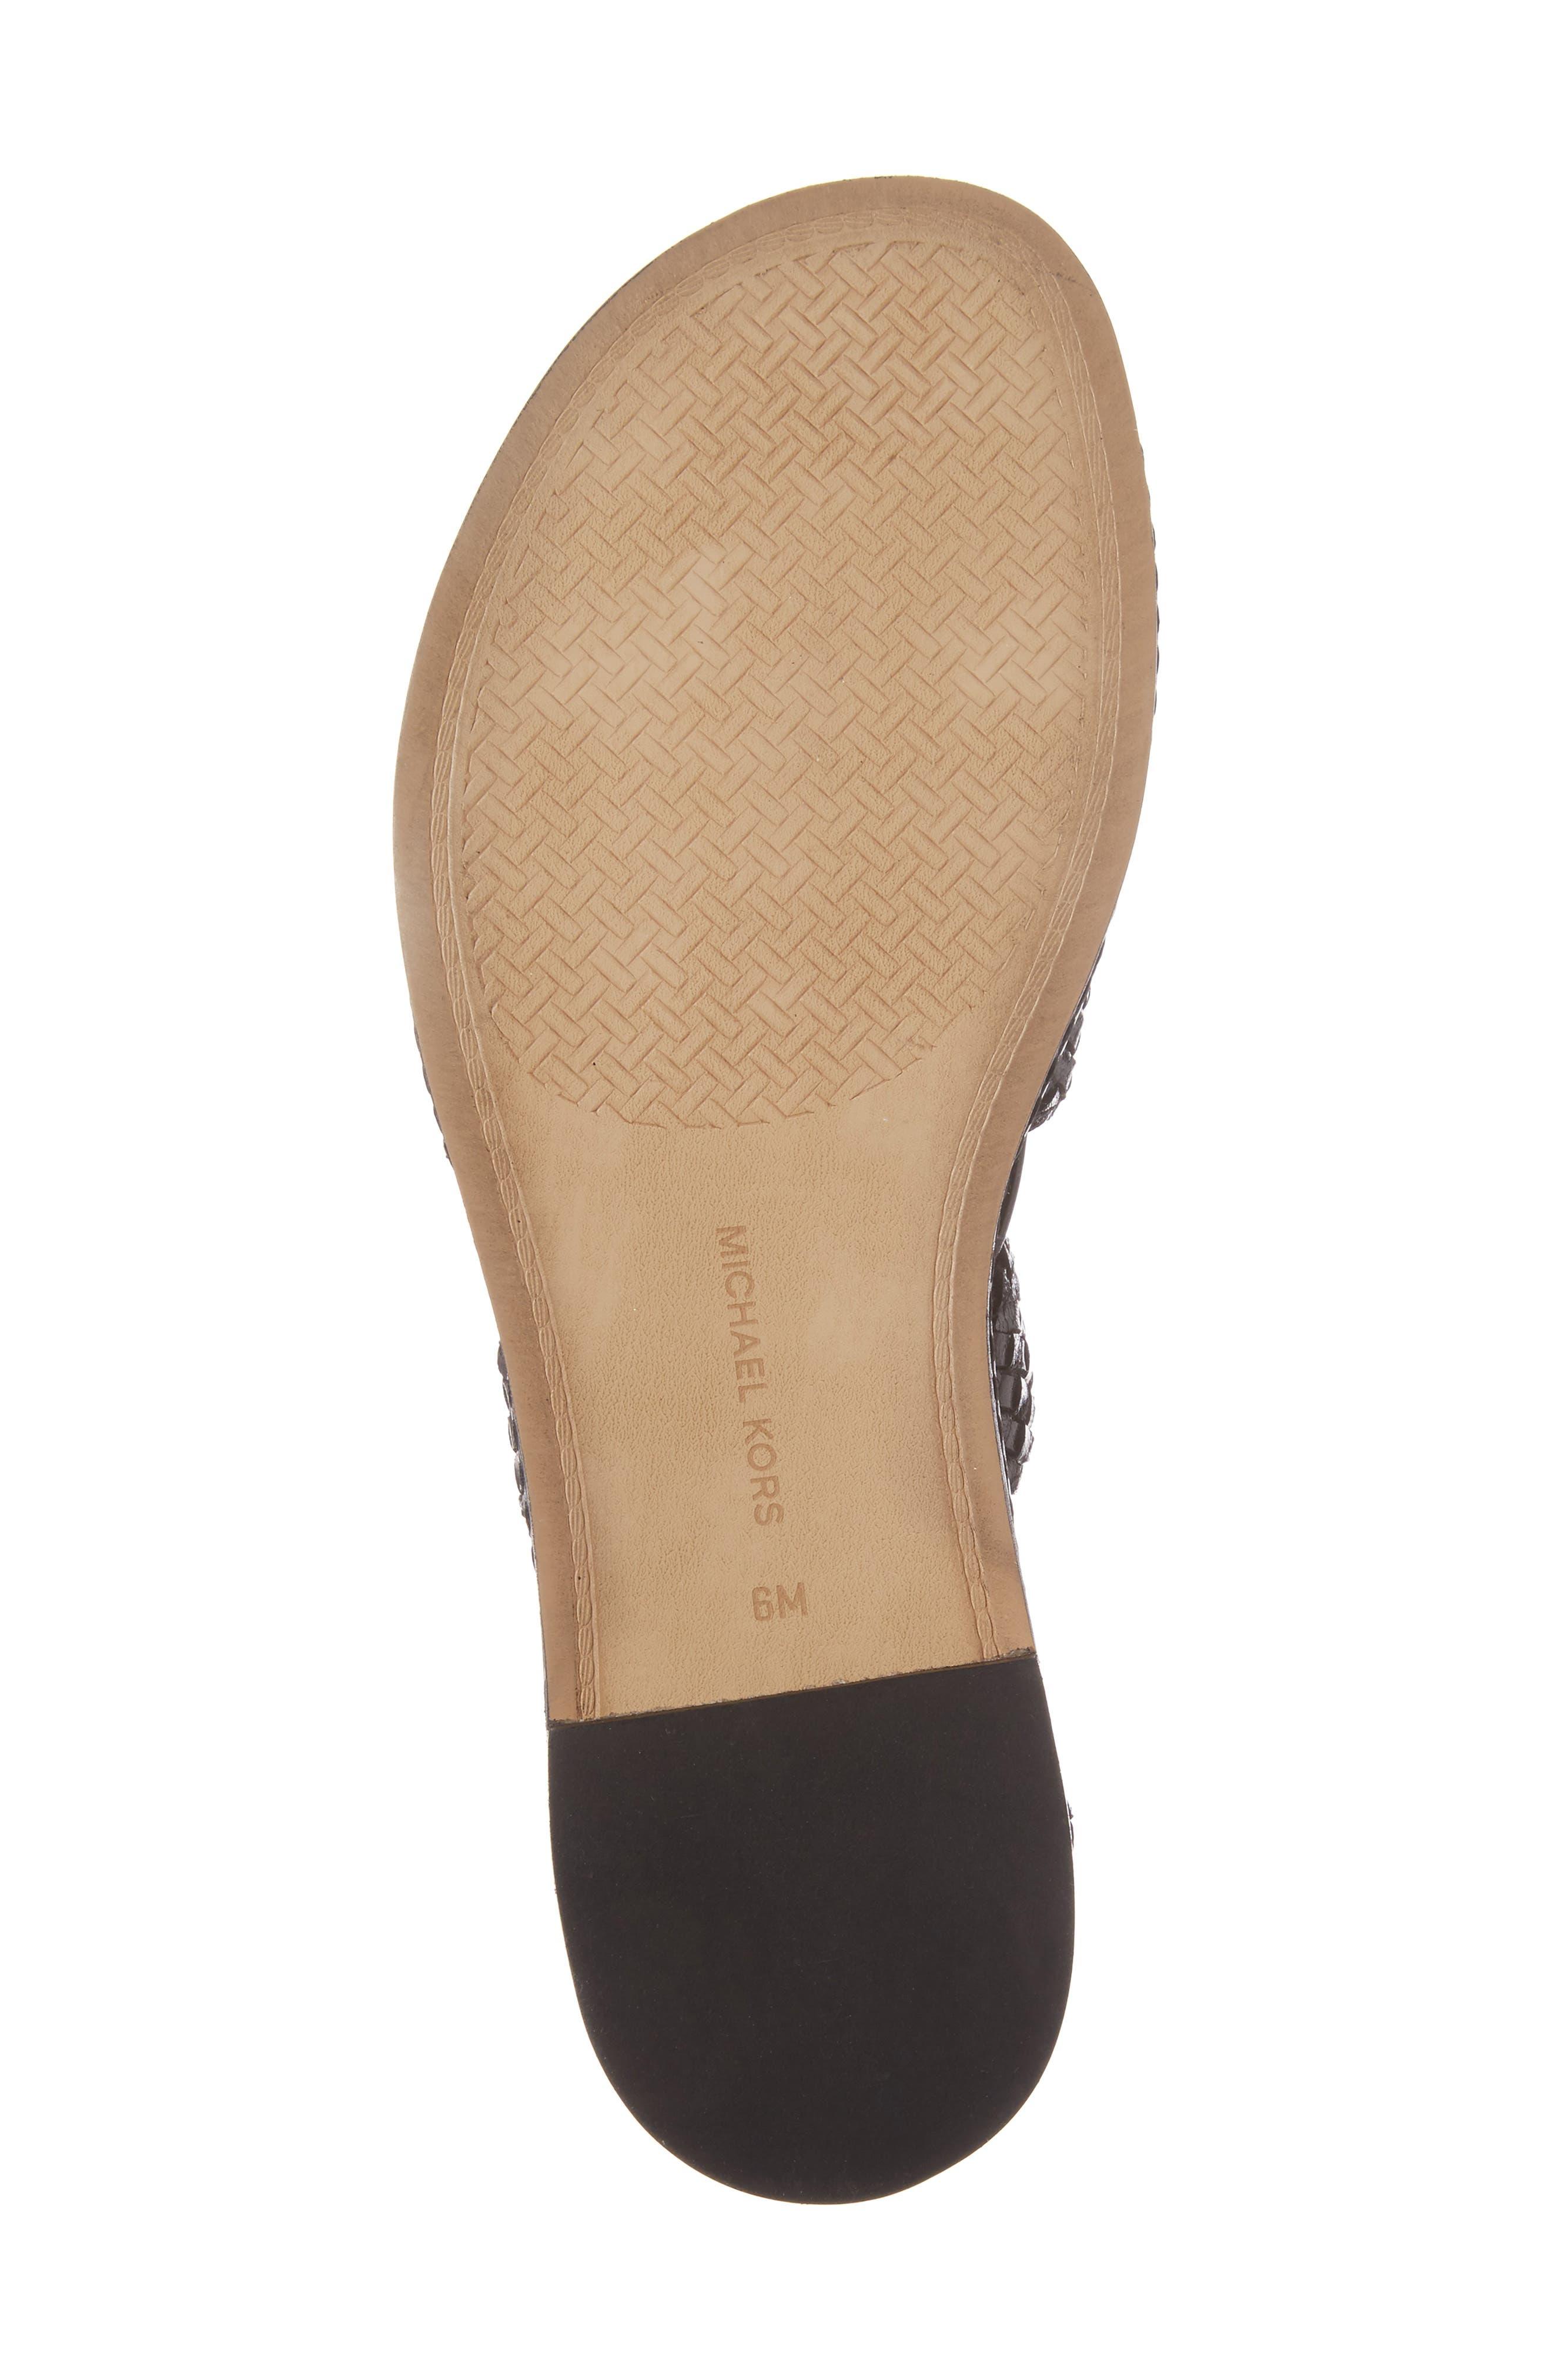 Monterey Lace-Up Gladiator Sandal,                             Alternate thumbnail 6, color,                             001